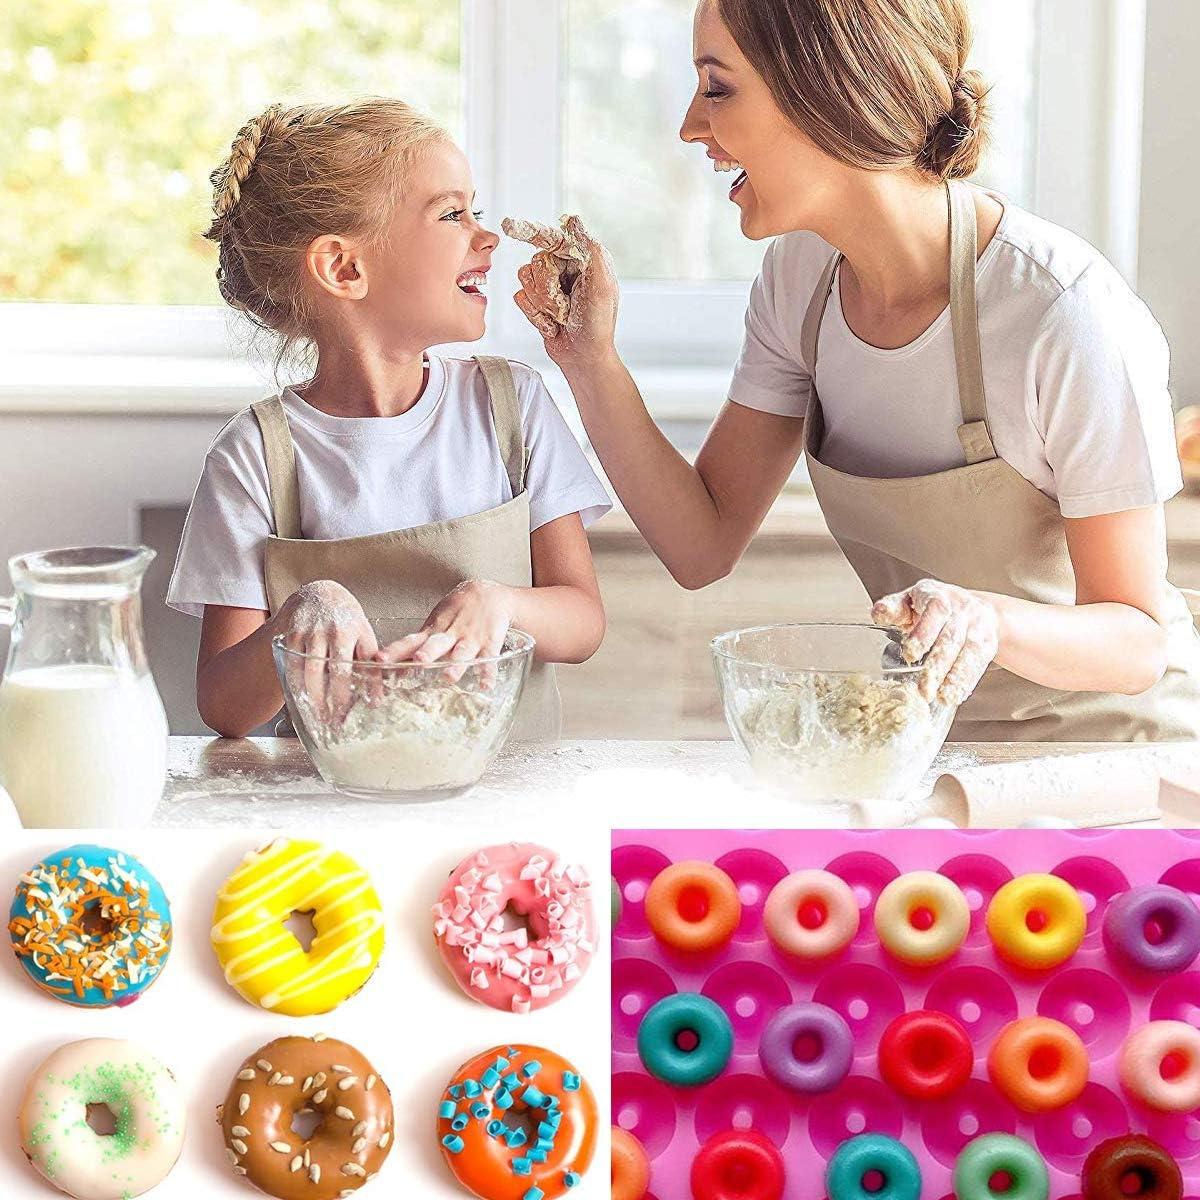 4PCS Mini Donut Silikonform Antihaft Backform DIY Backenf/ür S/ü/ßigkeiten Schokolade Gelee Eisw/ürfel Osuter Silikon Donut Formen